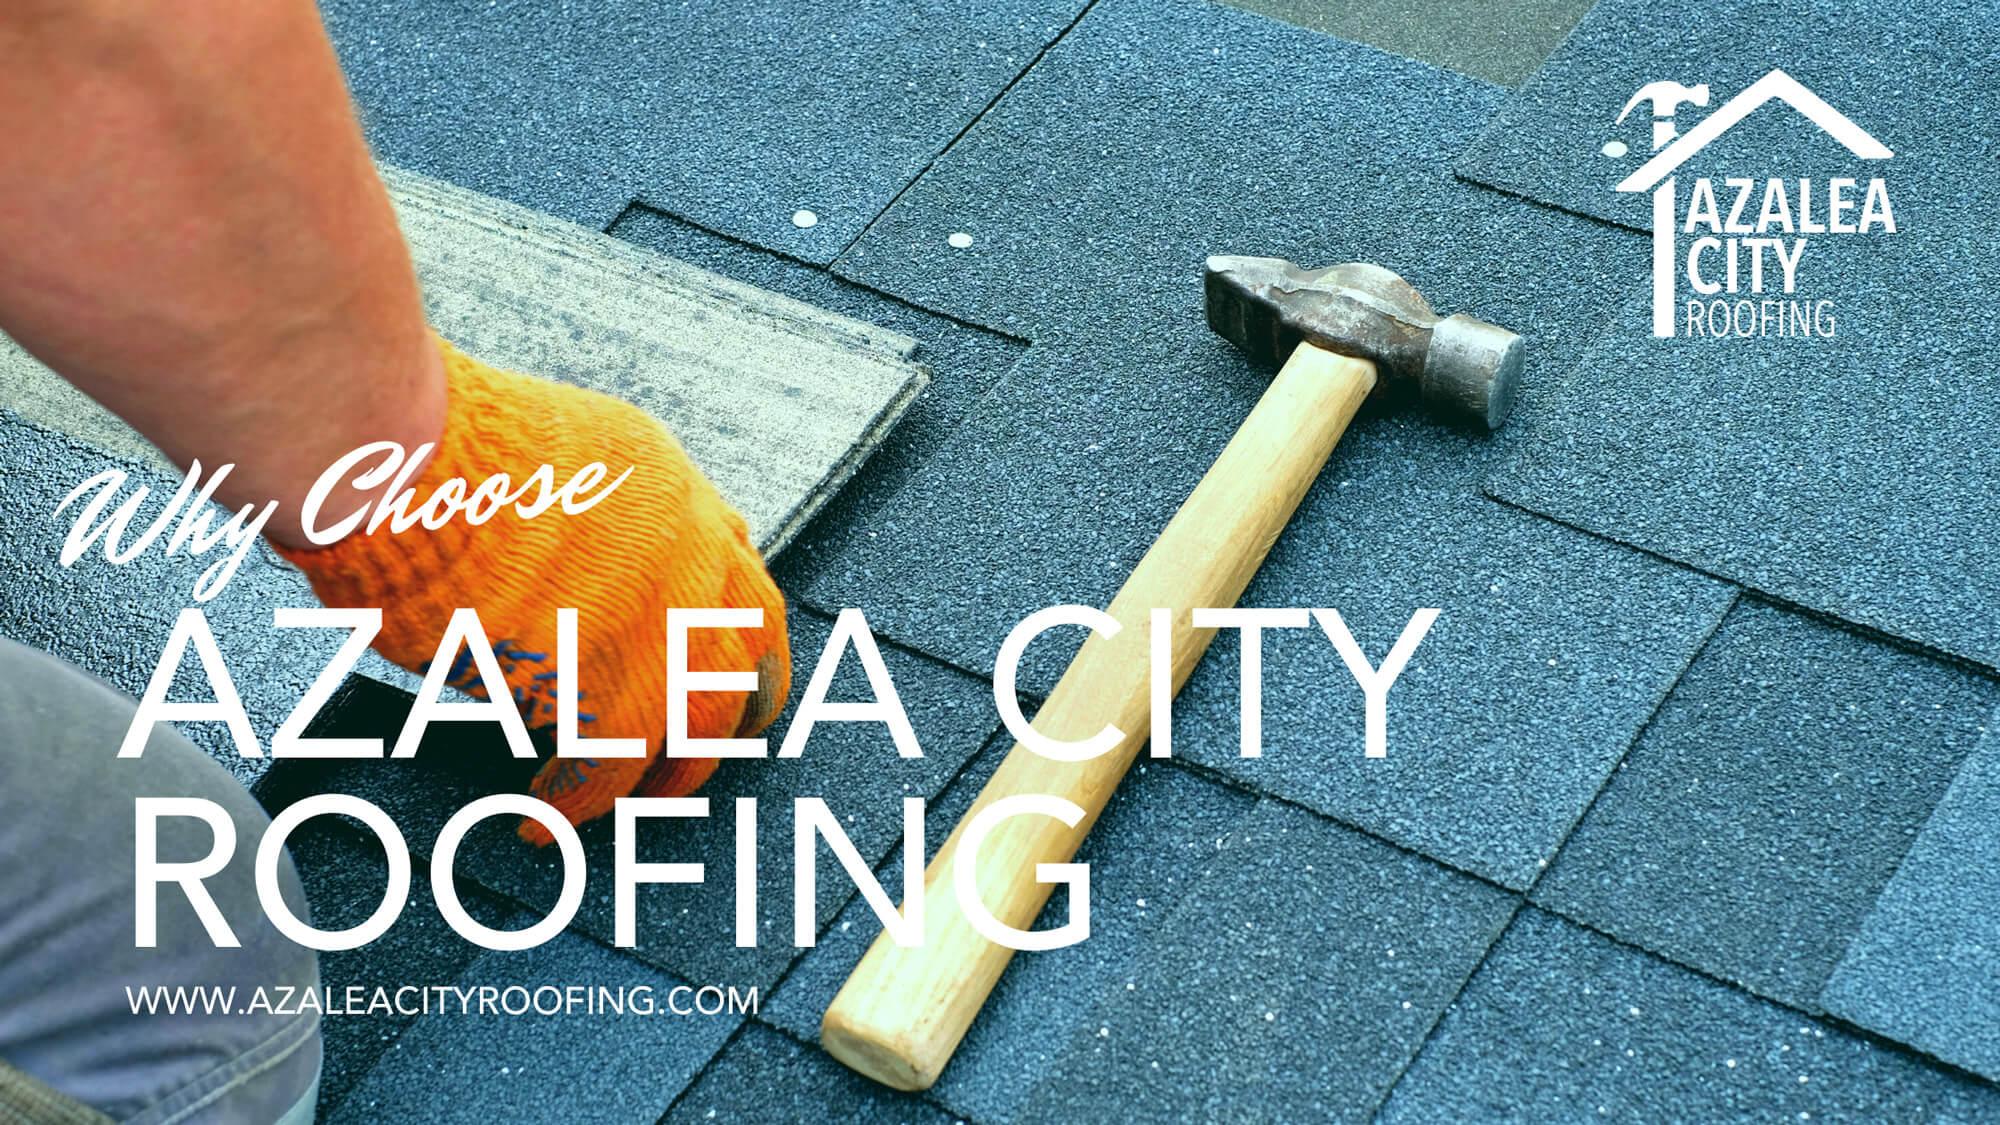 Why Choose Azalea City Roofing?